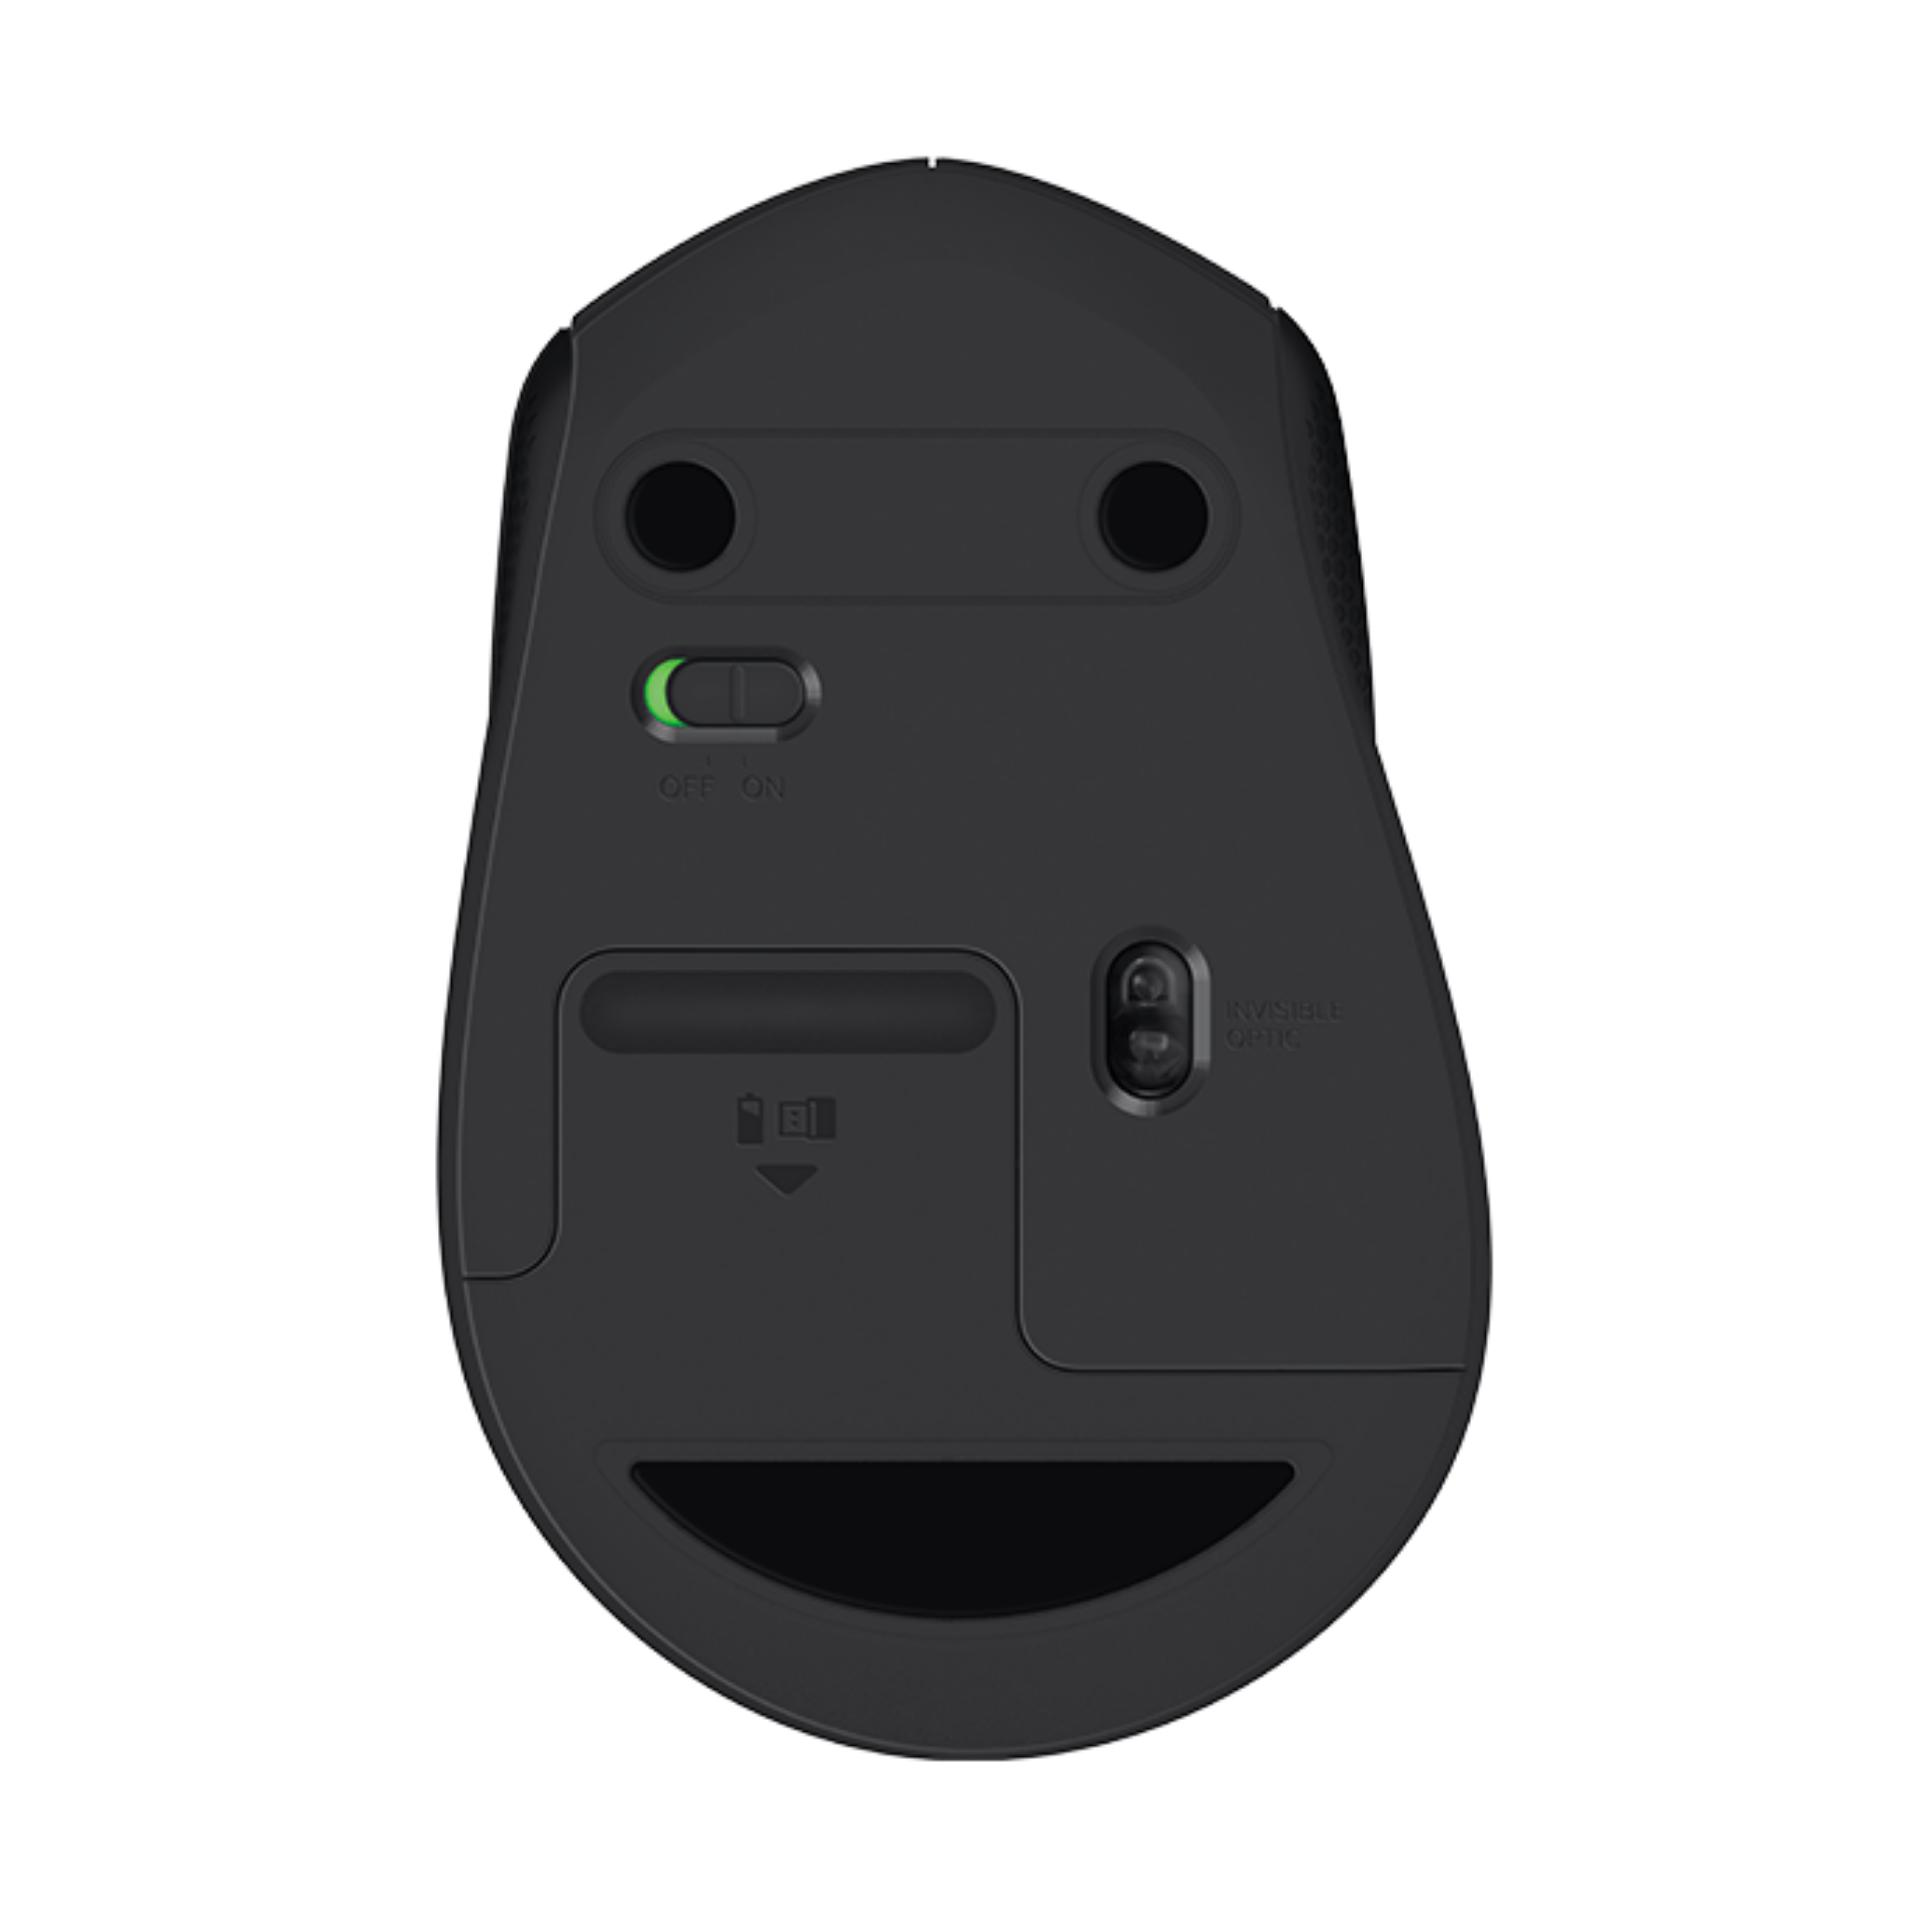 Promo Harga Logitech Mk220 Wireless Keyboard Mouse Terbaru 2018 Combo Original Philippines M331 Silent Plus Black Cheap